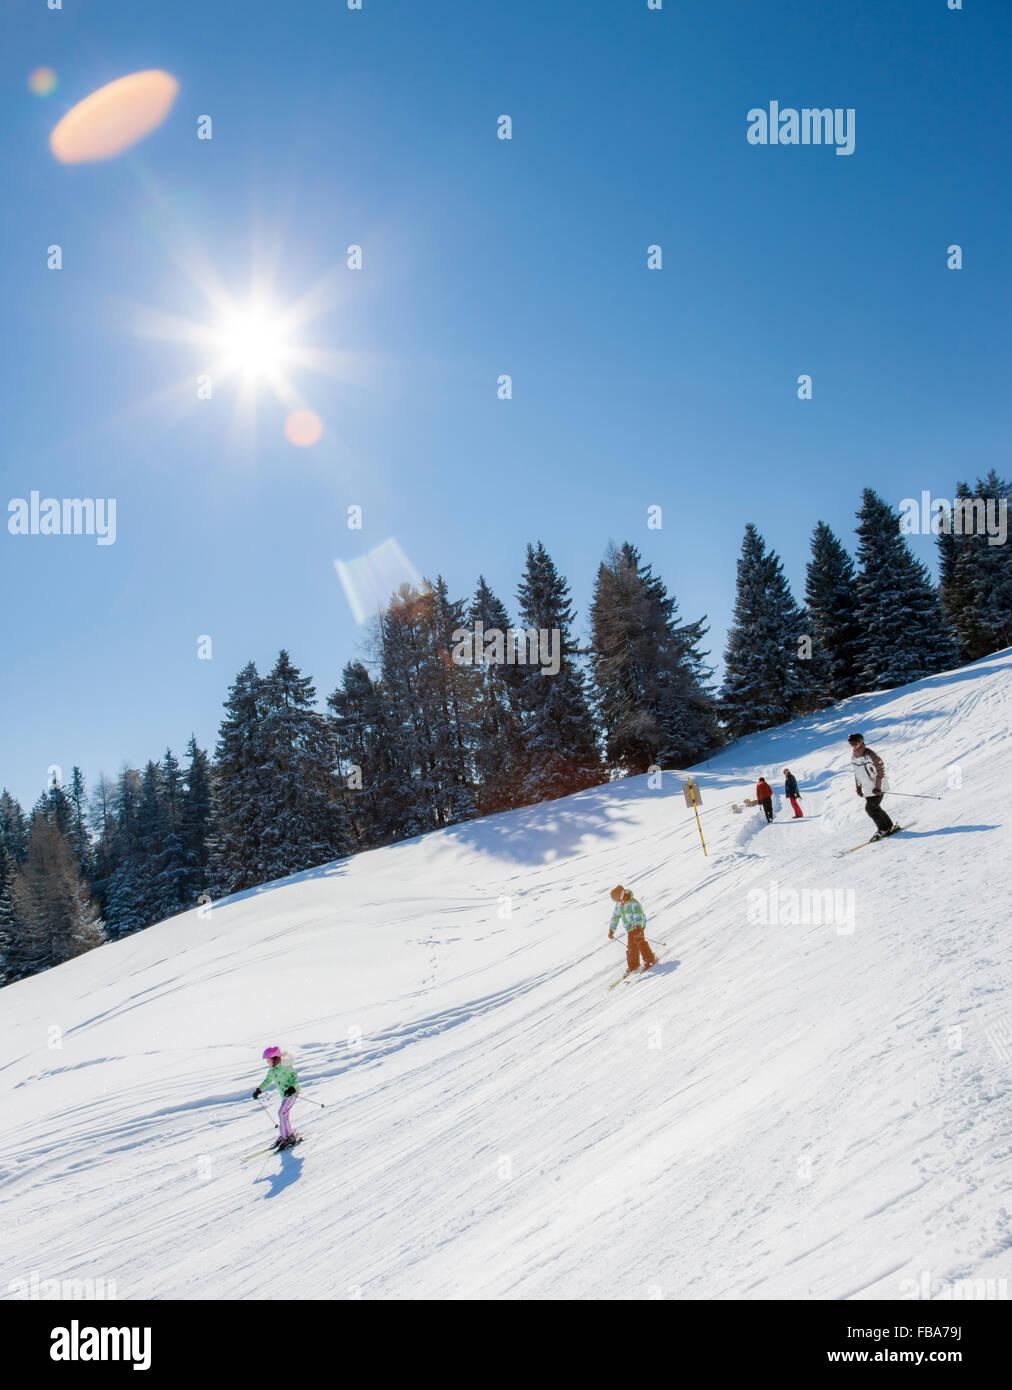 Switzerland, Lenzerheide, People skiing - Stock Image